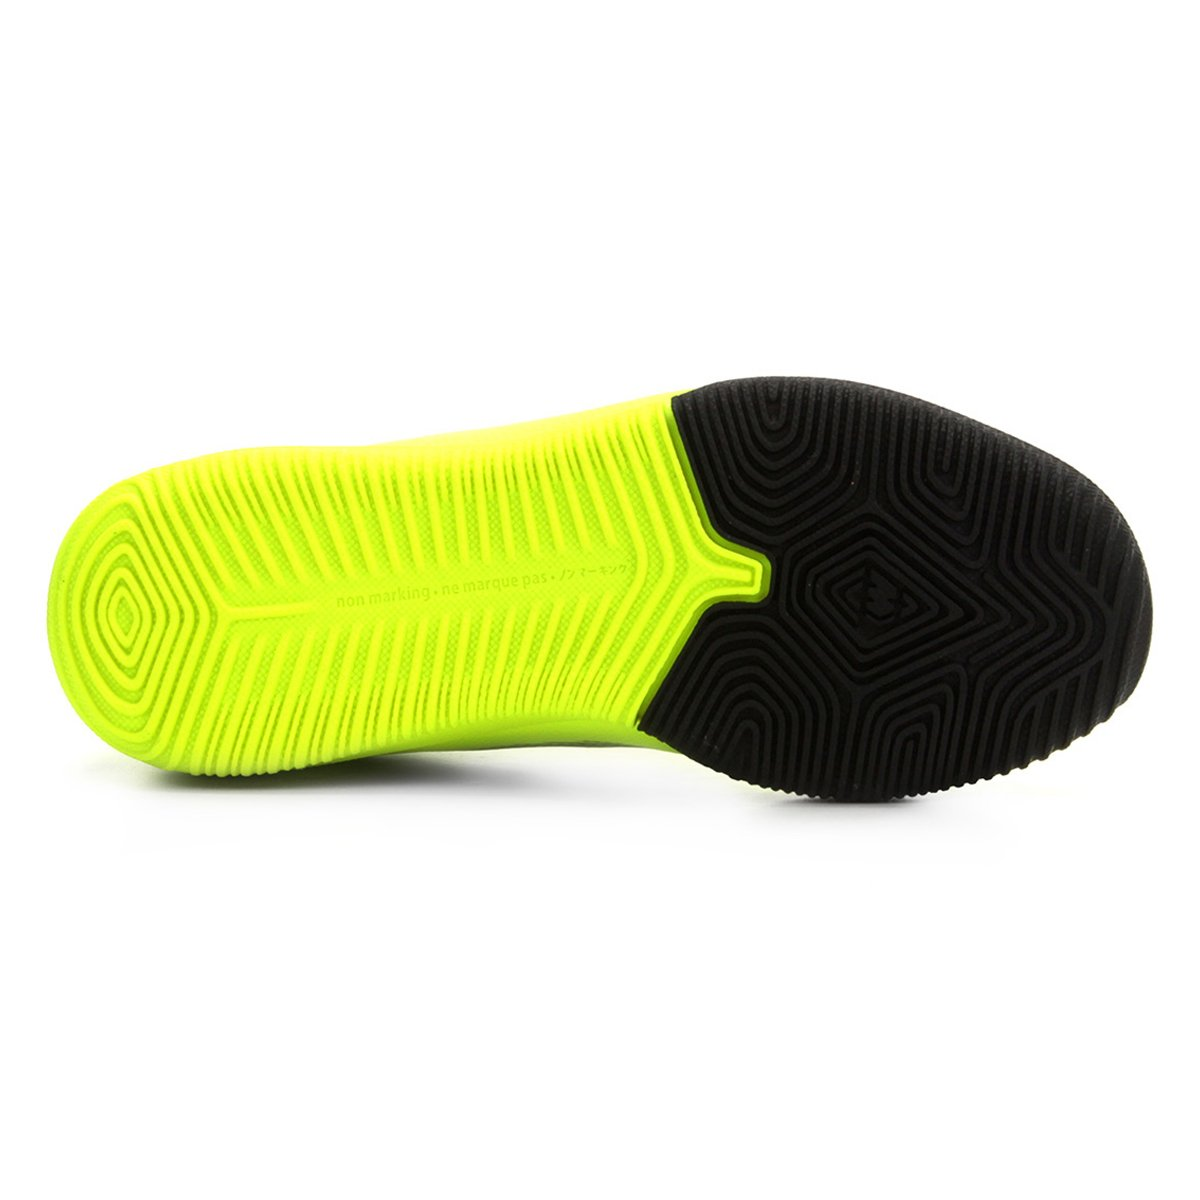 e671596237237 Chuteira Futsal Infantil Nike Mercurial Vapor 12 Academy GS IC - Tam ...